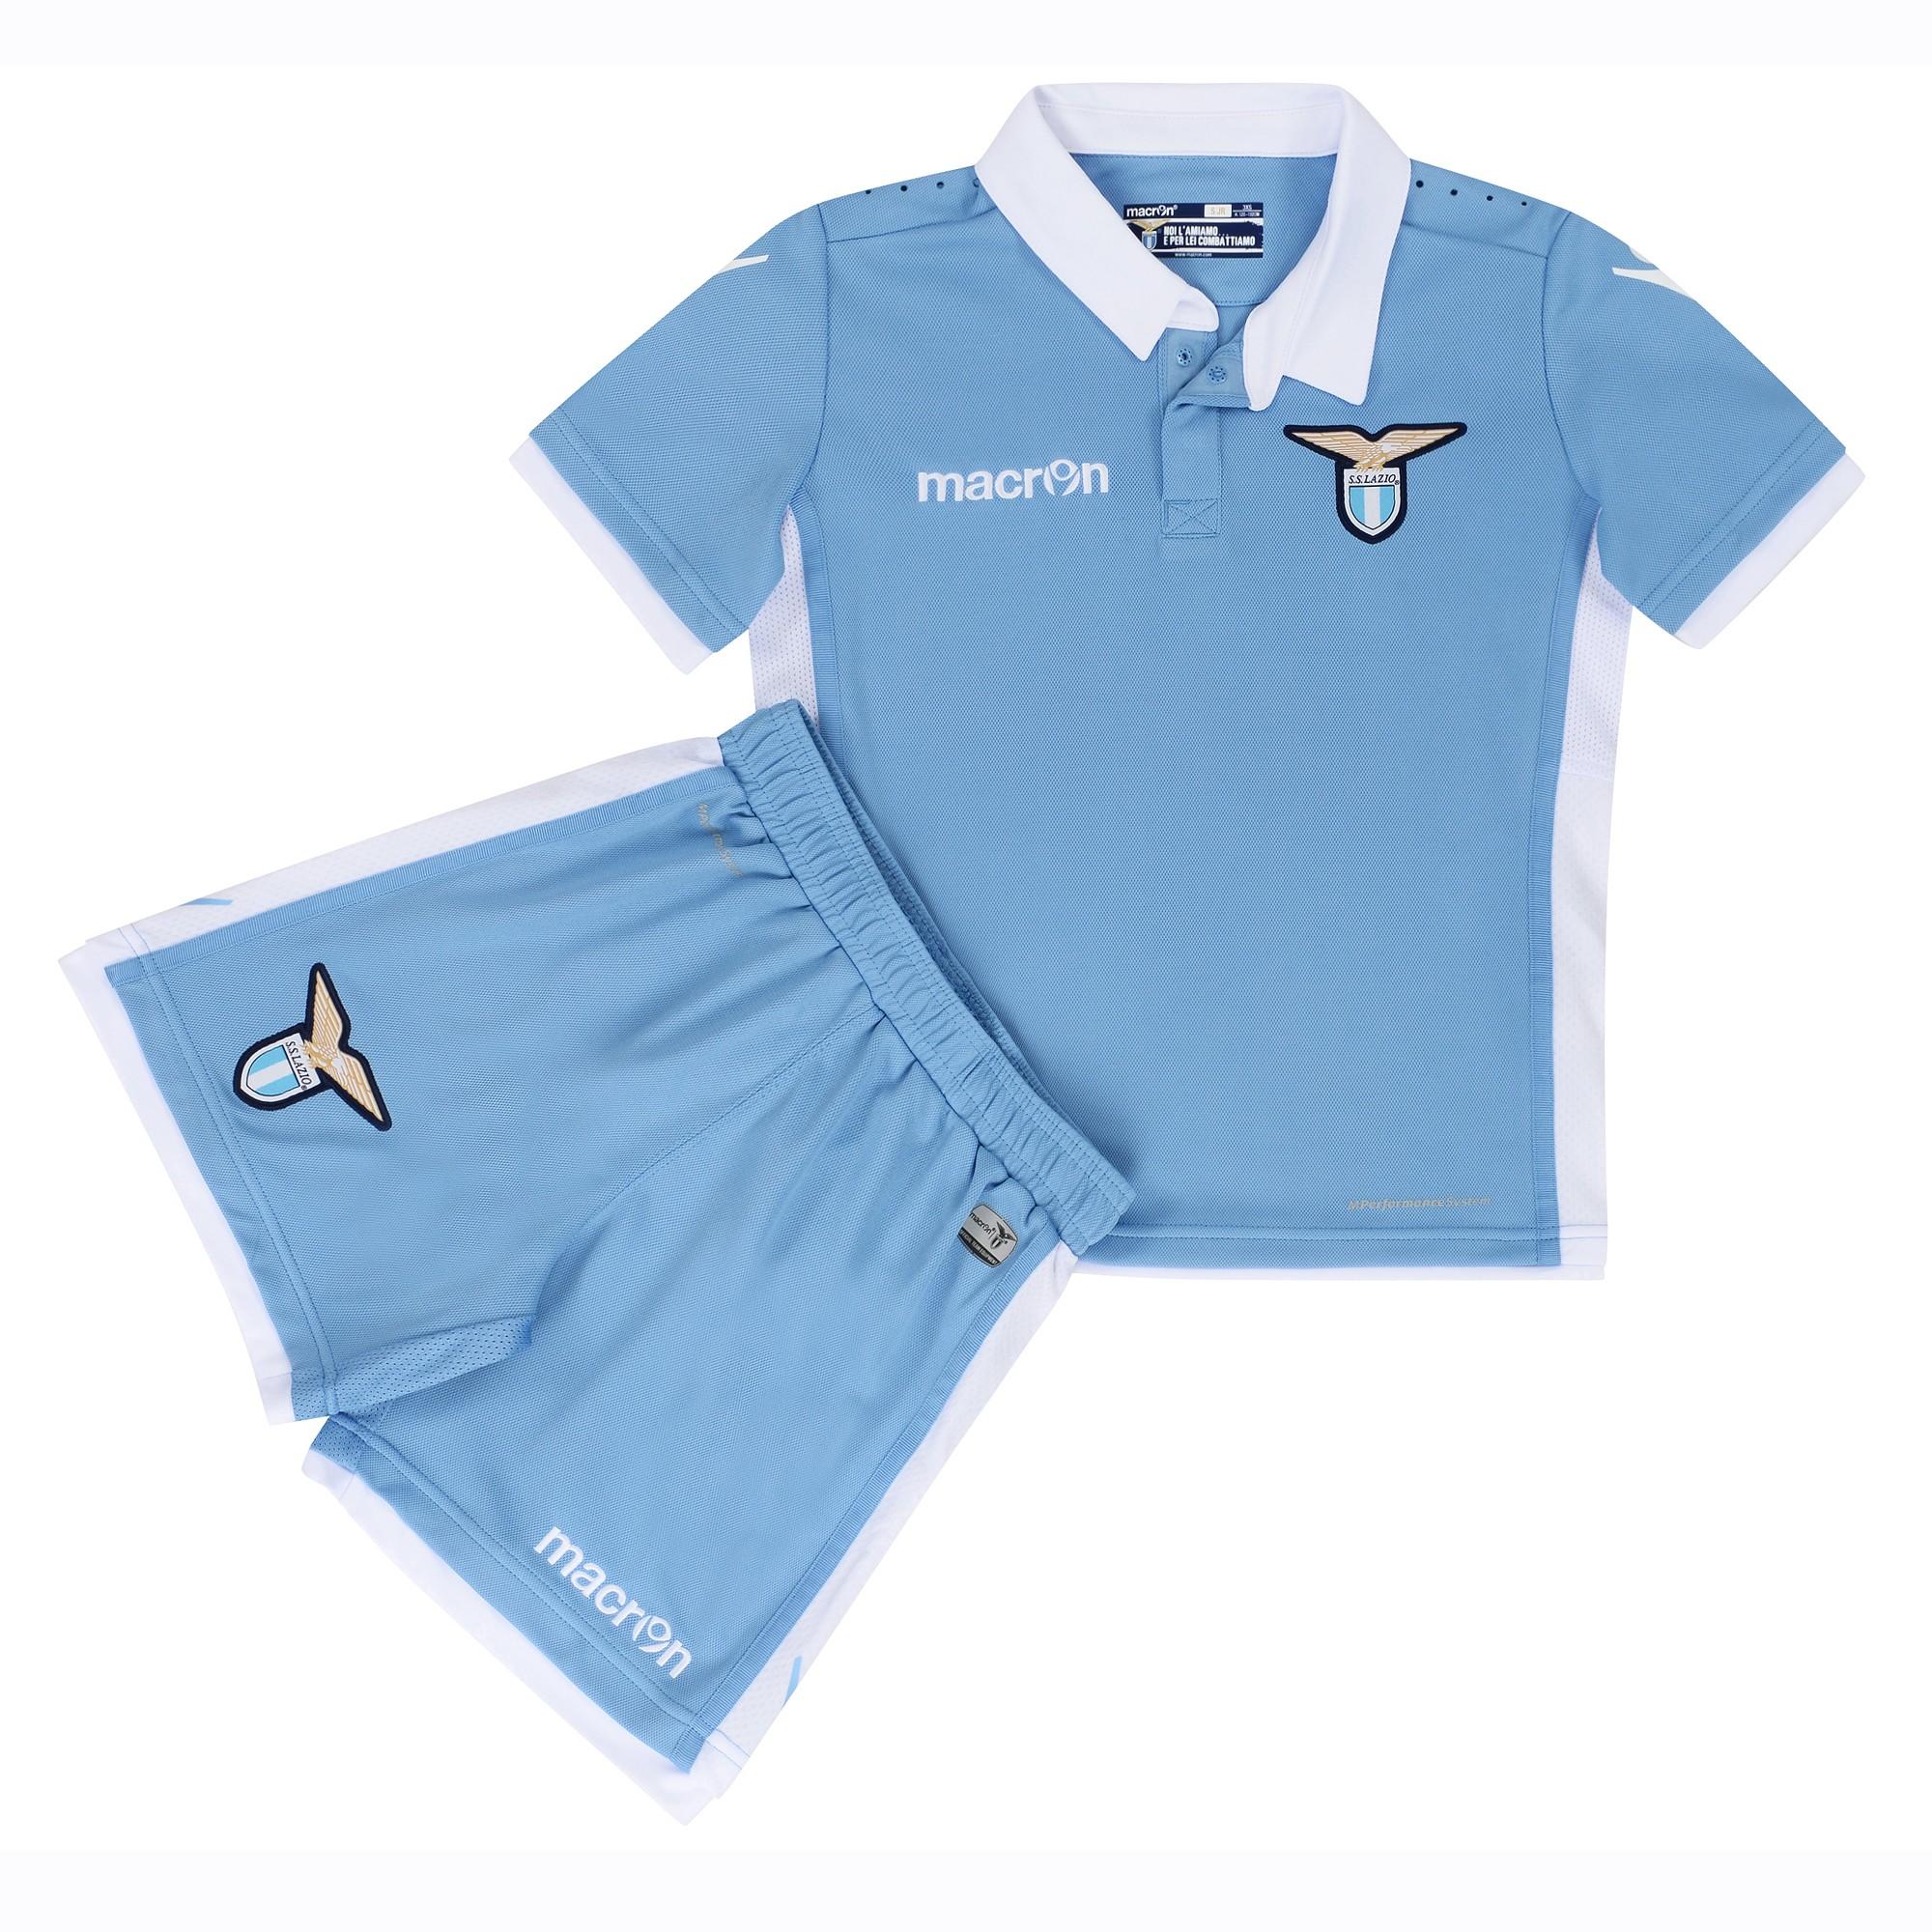 2016-2017 Lazio Home Macron Mini Kit